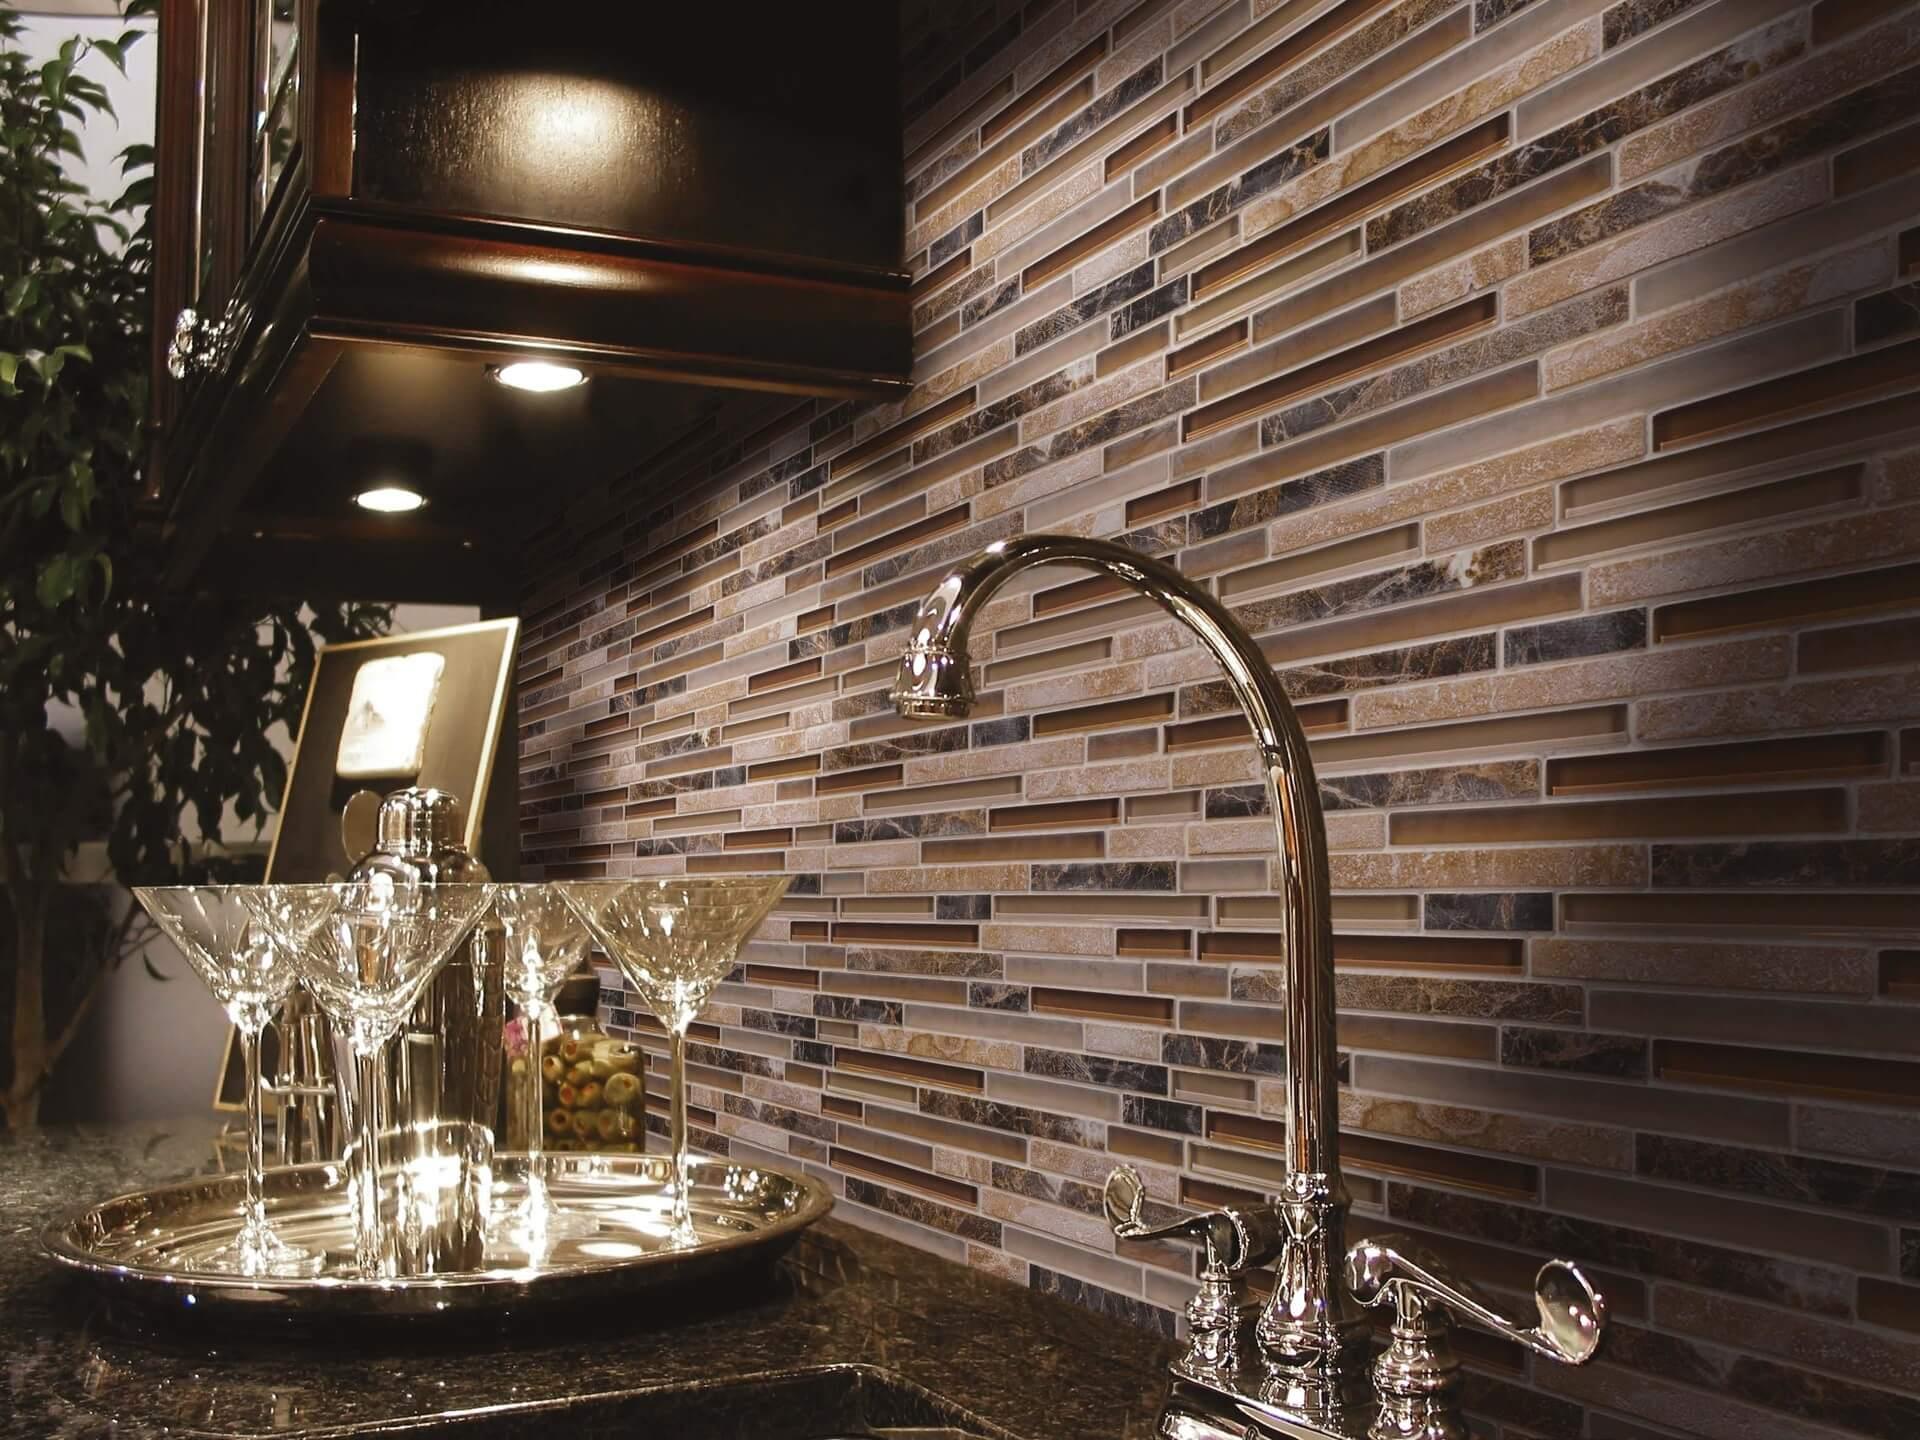 ice rock espresso stone mosaic tiles 12x12